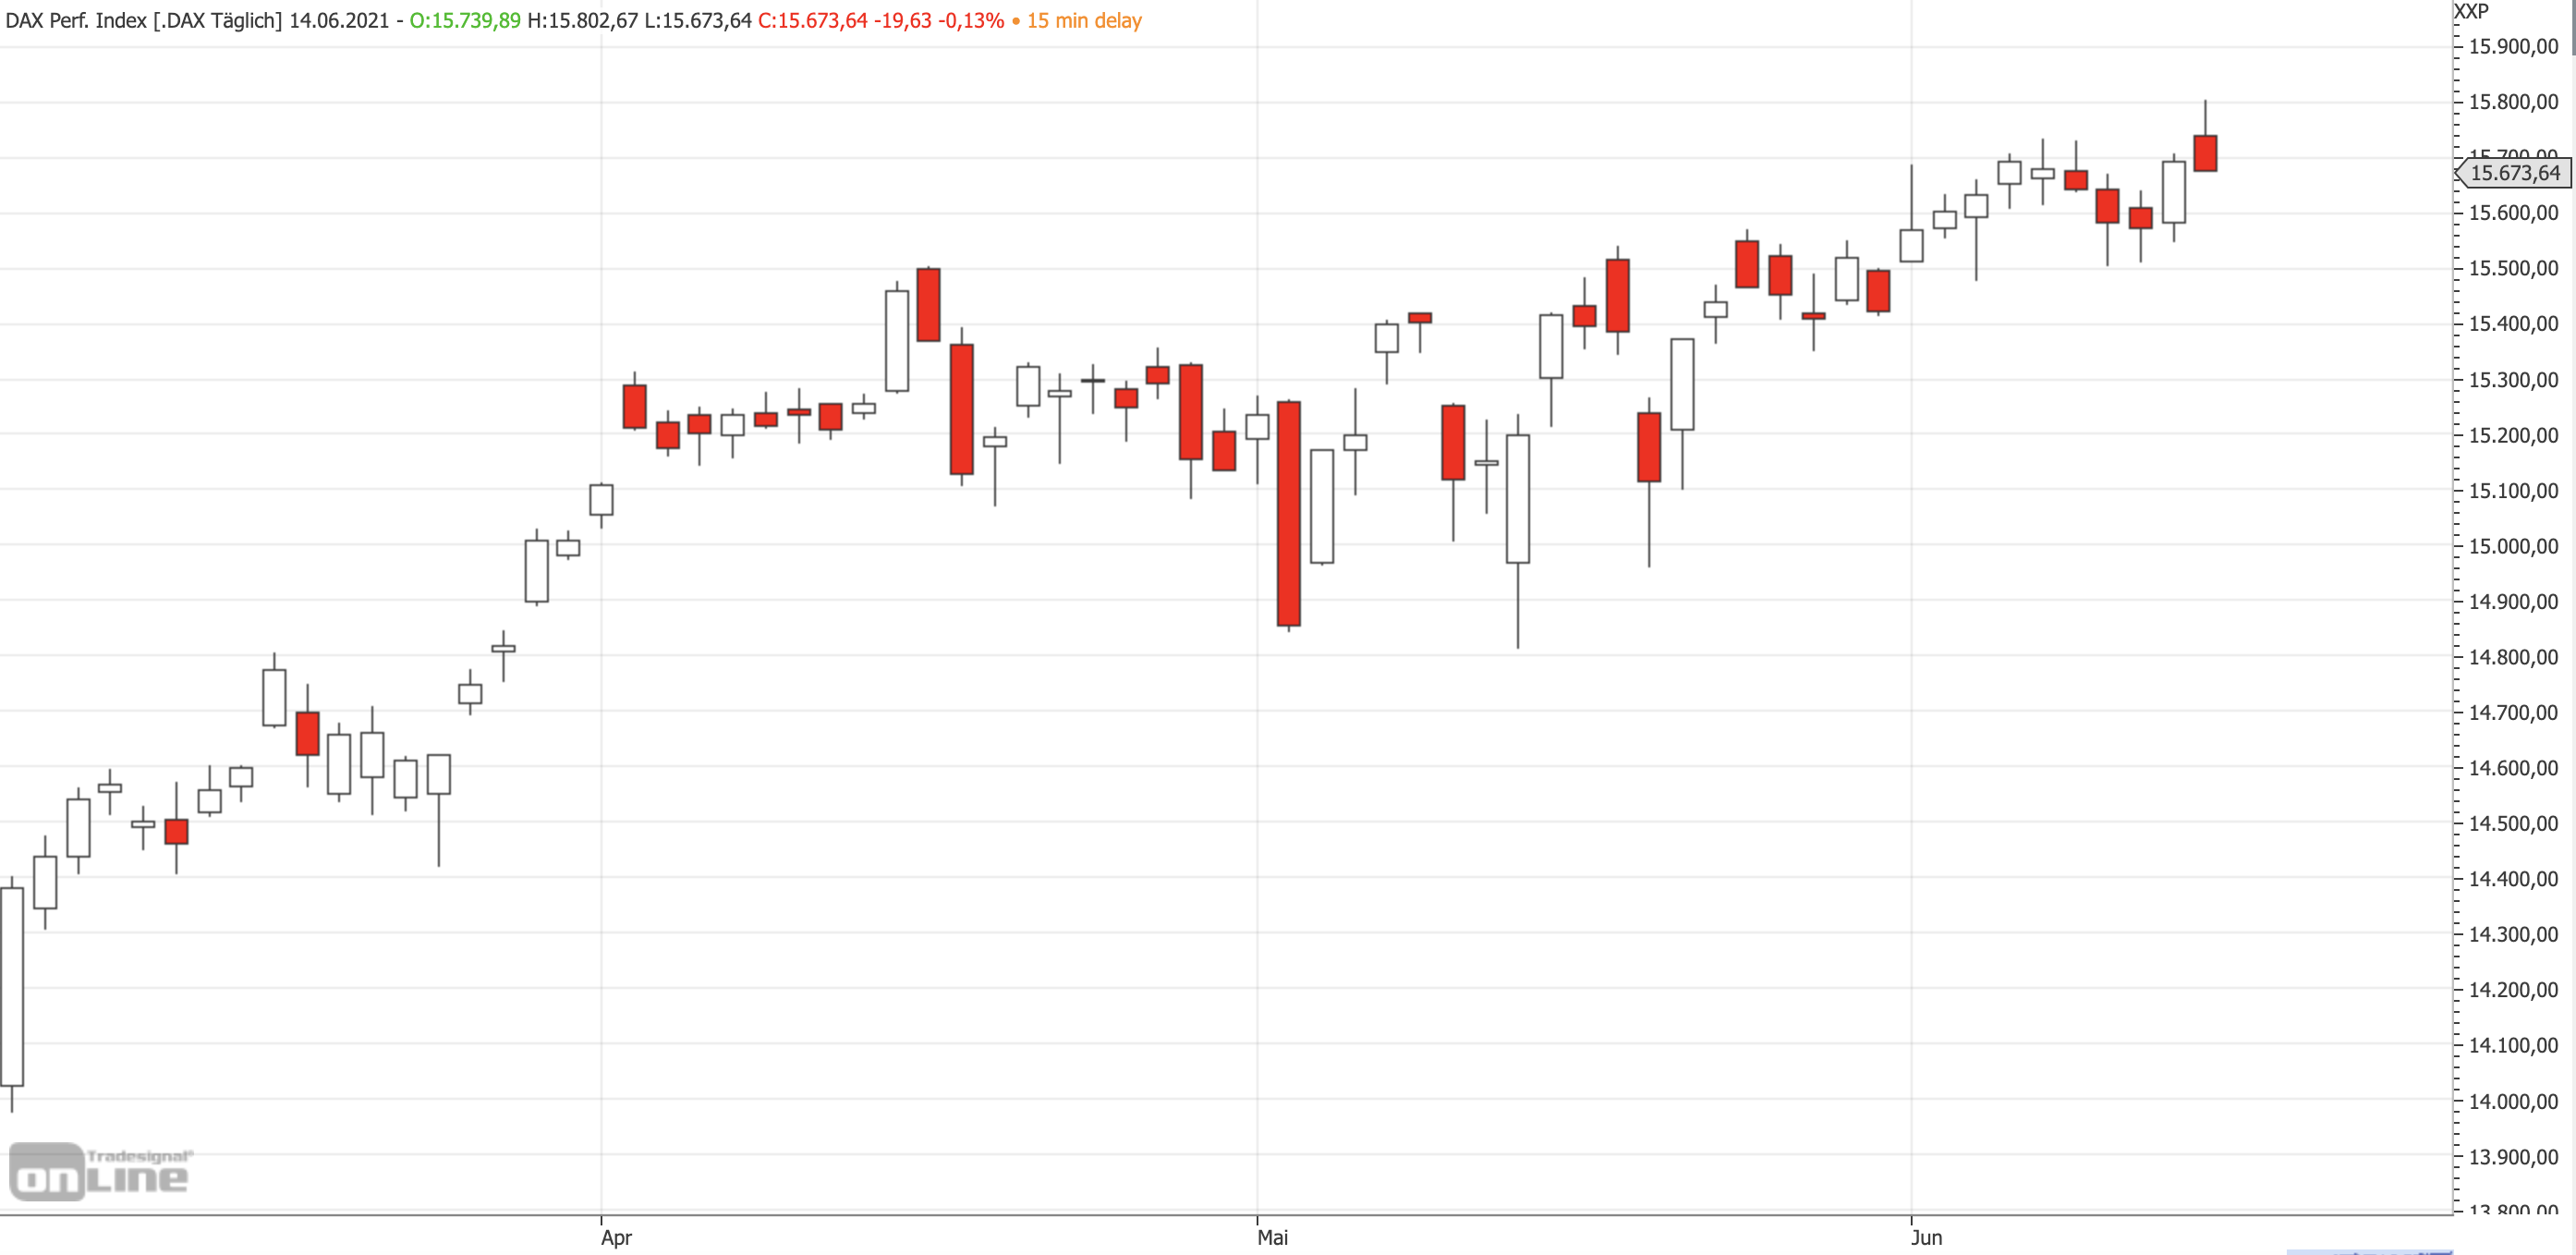 Mittelfristiger DAX-Chart am 14.06.2021